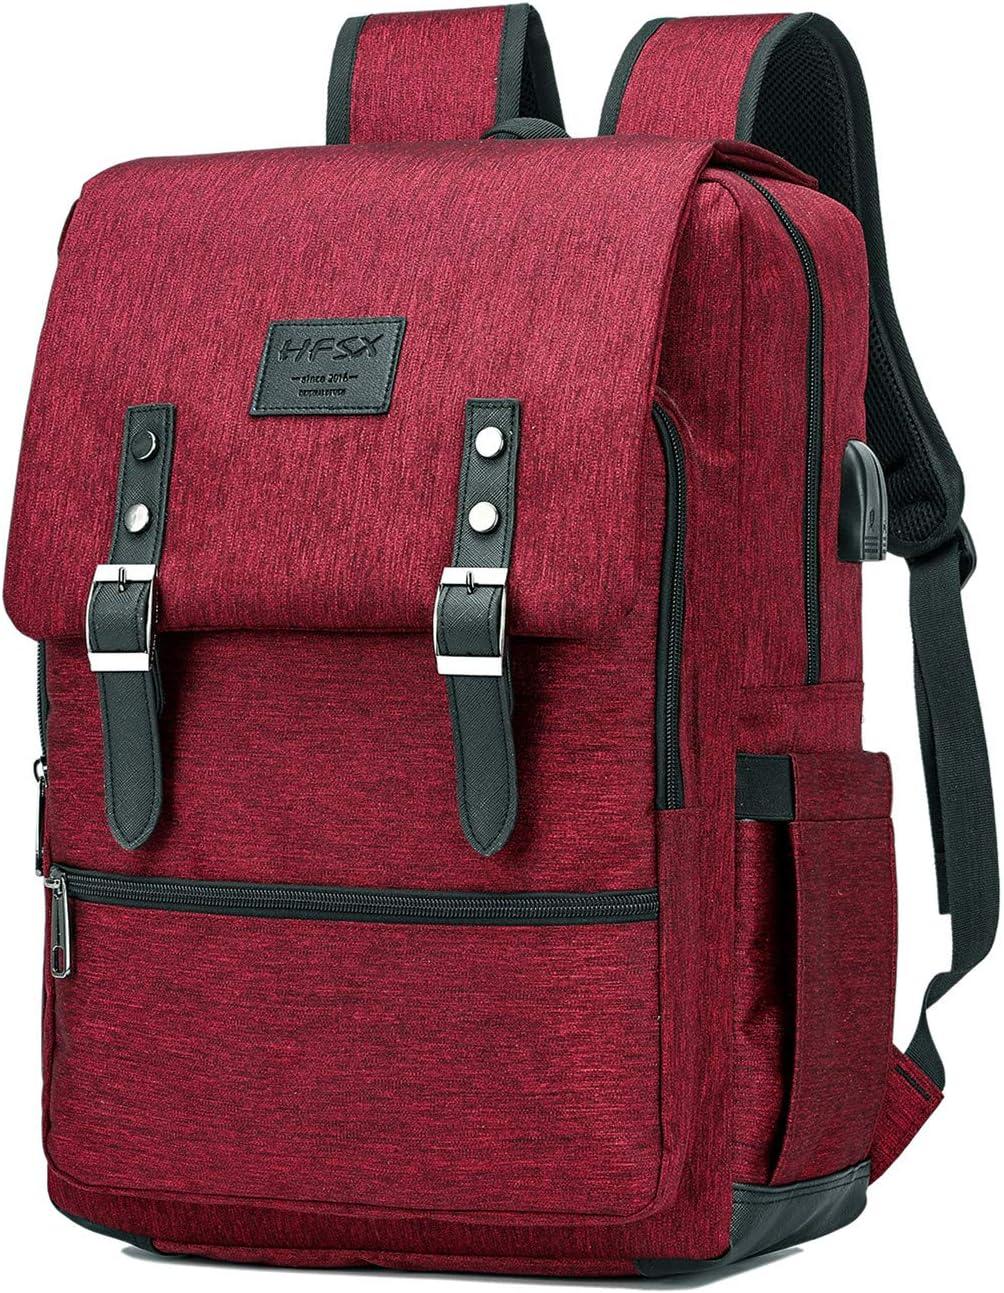 Vintage Backpack Anti Theft Laptop Backpack Men Women Business Travel Computer Backpack School College Bookbag Stylish Water Resistant Vintage Backpack with USB Port Fits 15.6 Inch Laptop